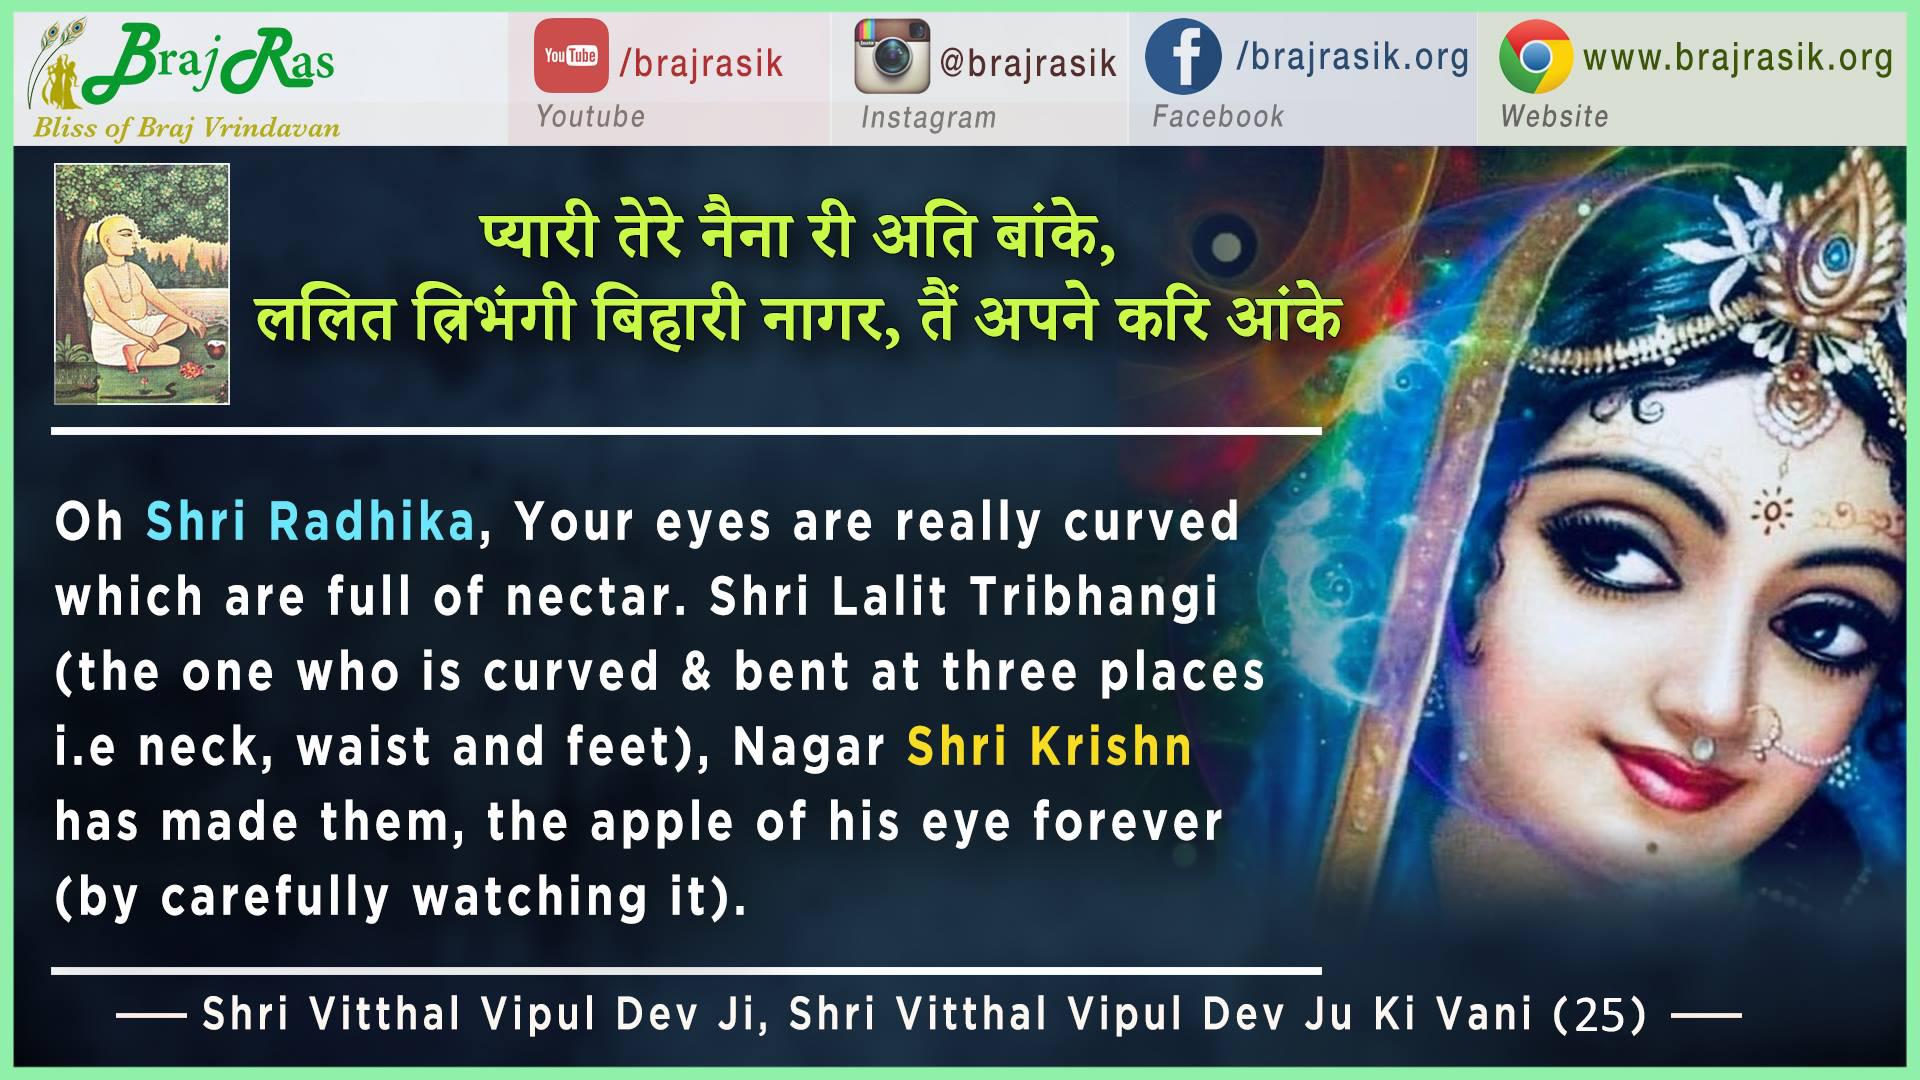 Pyari Tere Naina Ri Ati Banke, Lalit Tribhangi Bihari Nagar - Shri Vitthal Vipul Dev Ji, Shri Vitthal Vipul Dev Ju Ki Vani (24)